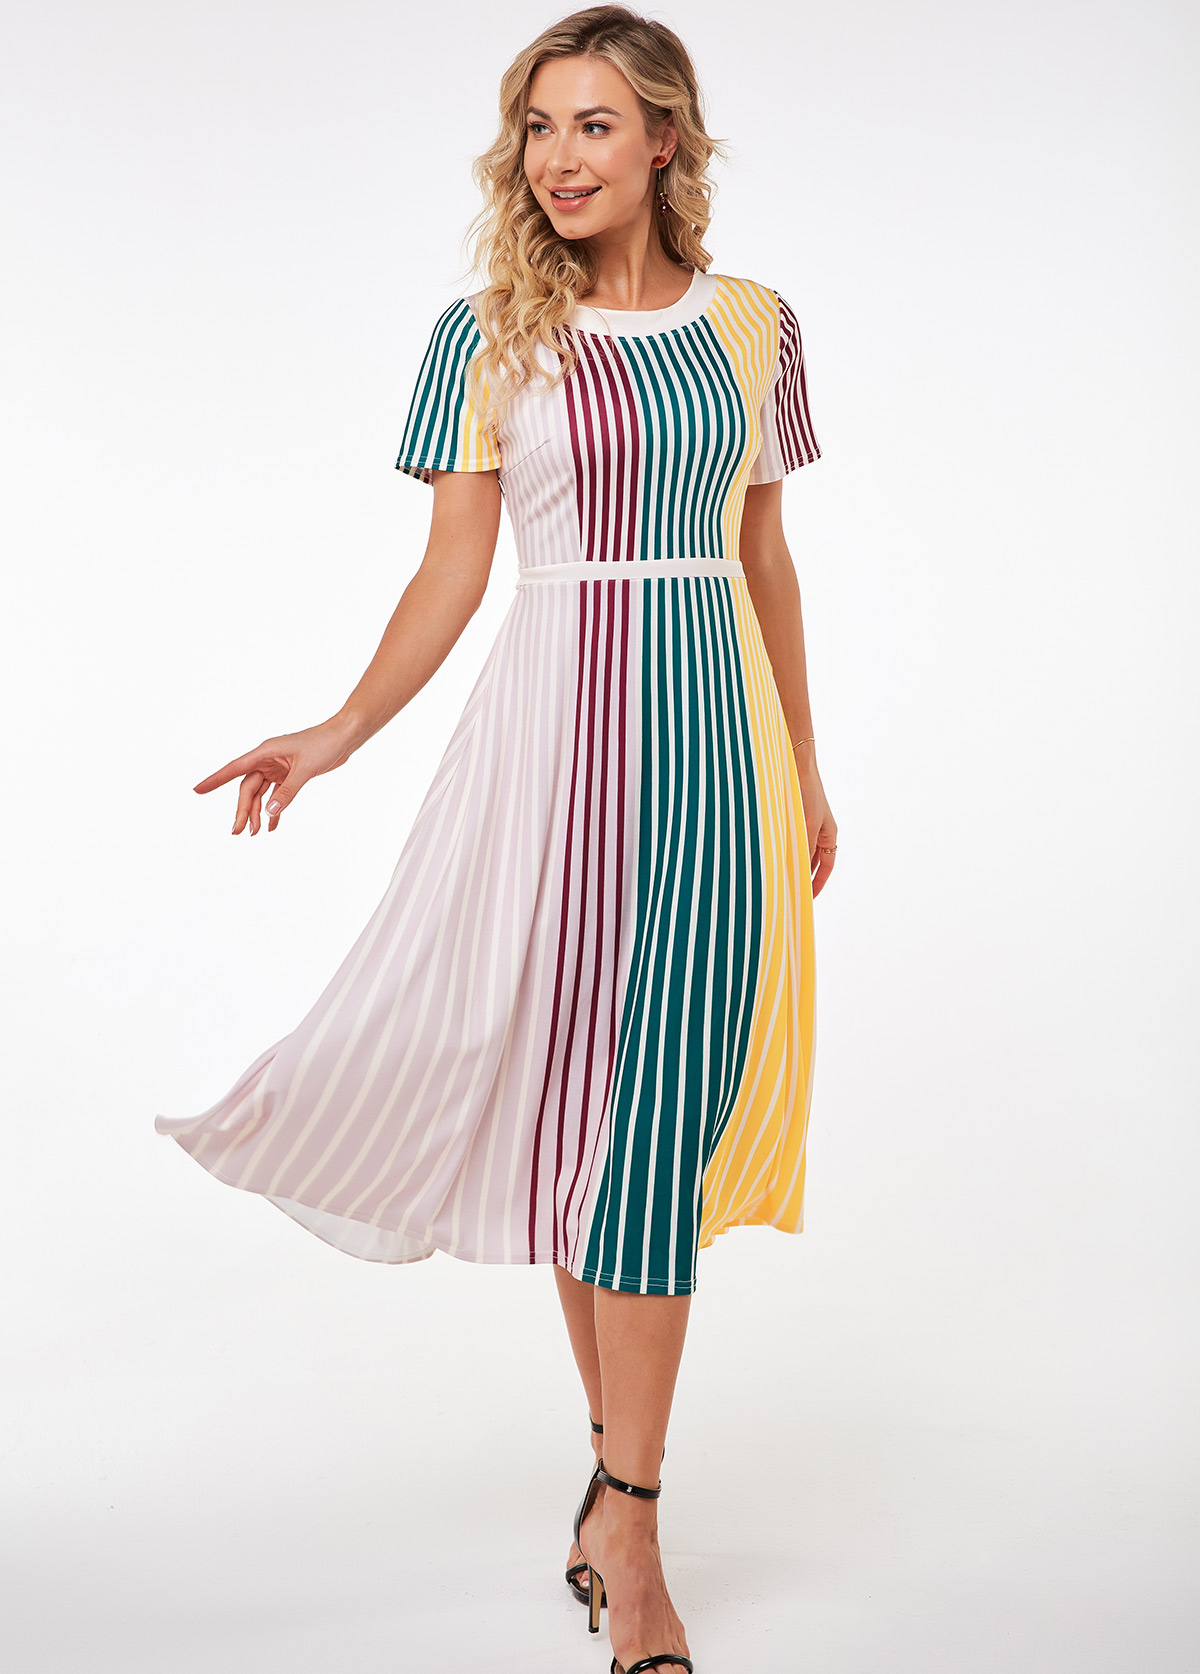 ROTITA Round Neck Short Sleeve Striped Dress